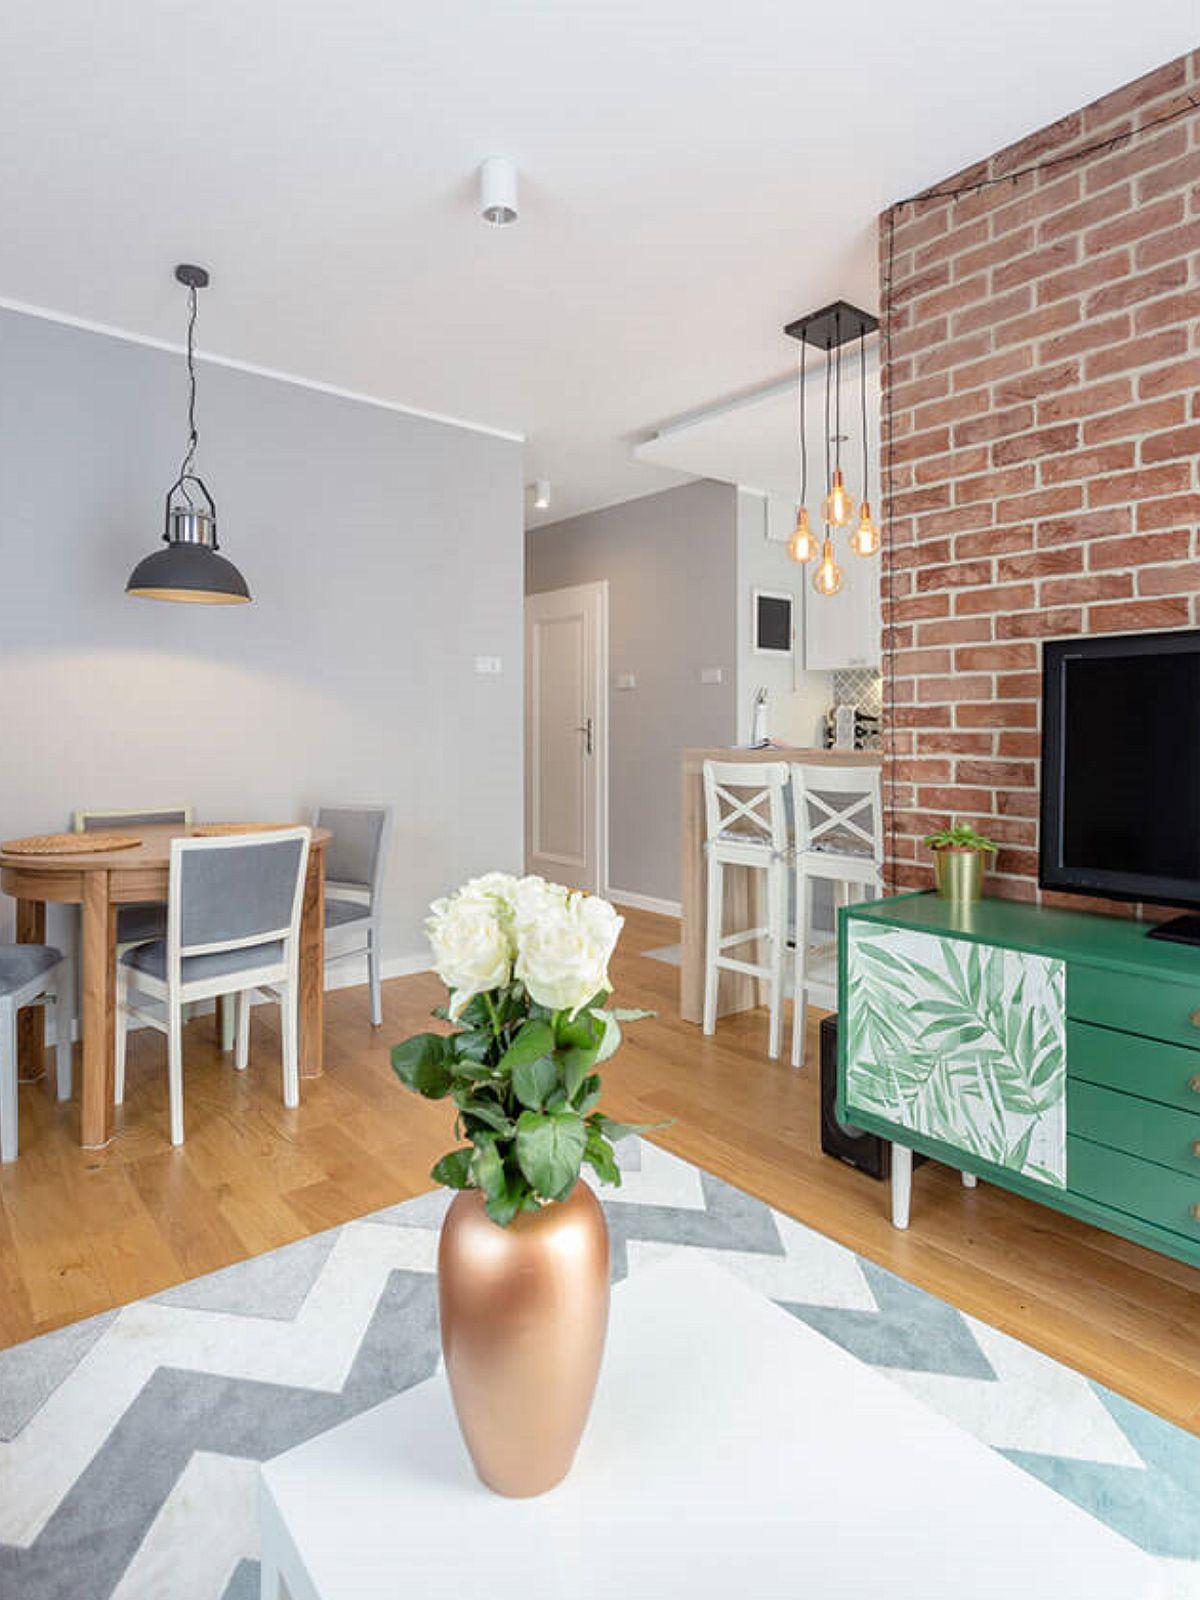 adelaparvu.com despre apartament de 2 camere luminos amenajat, design Kameleon, Foto Michal Mlynarczyk (3)